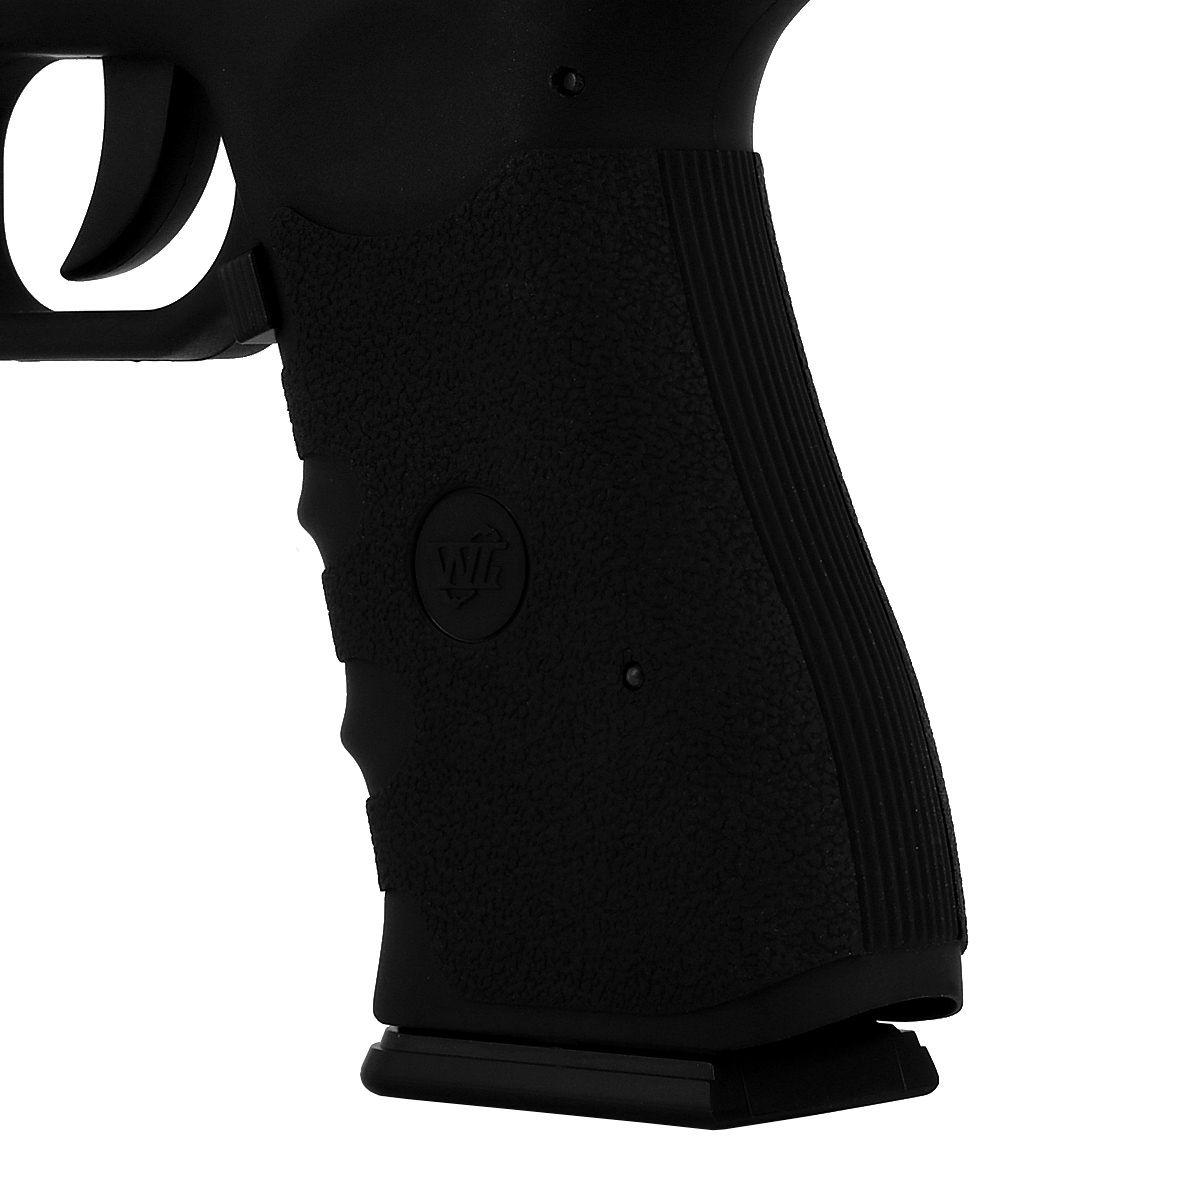 Pistola Airgun Gás Co2 Win Gun Glock W119 Blowback 4,5mm